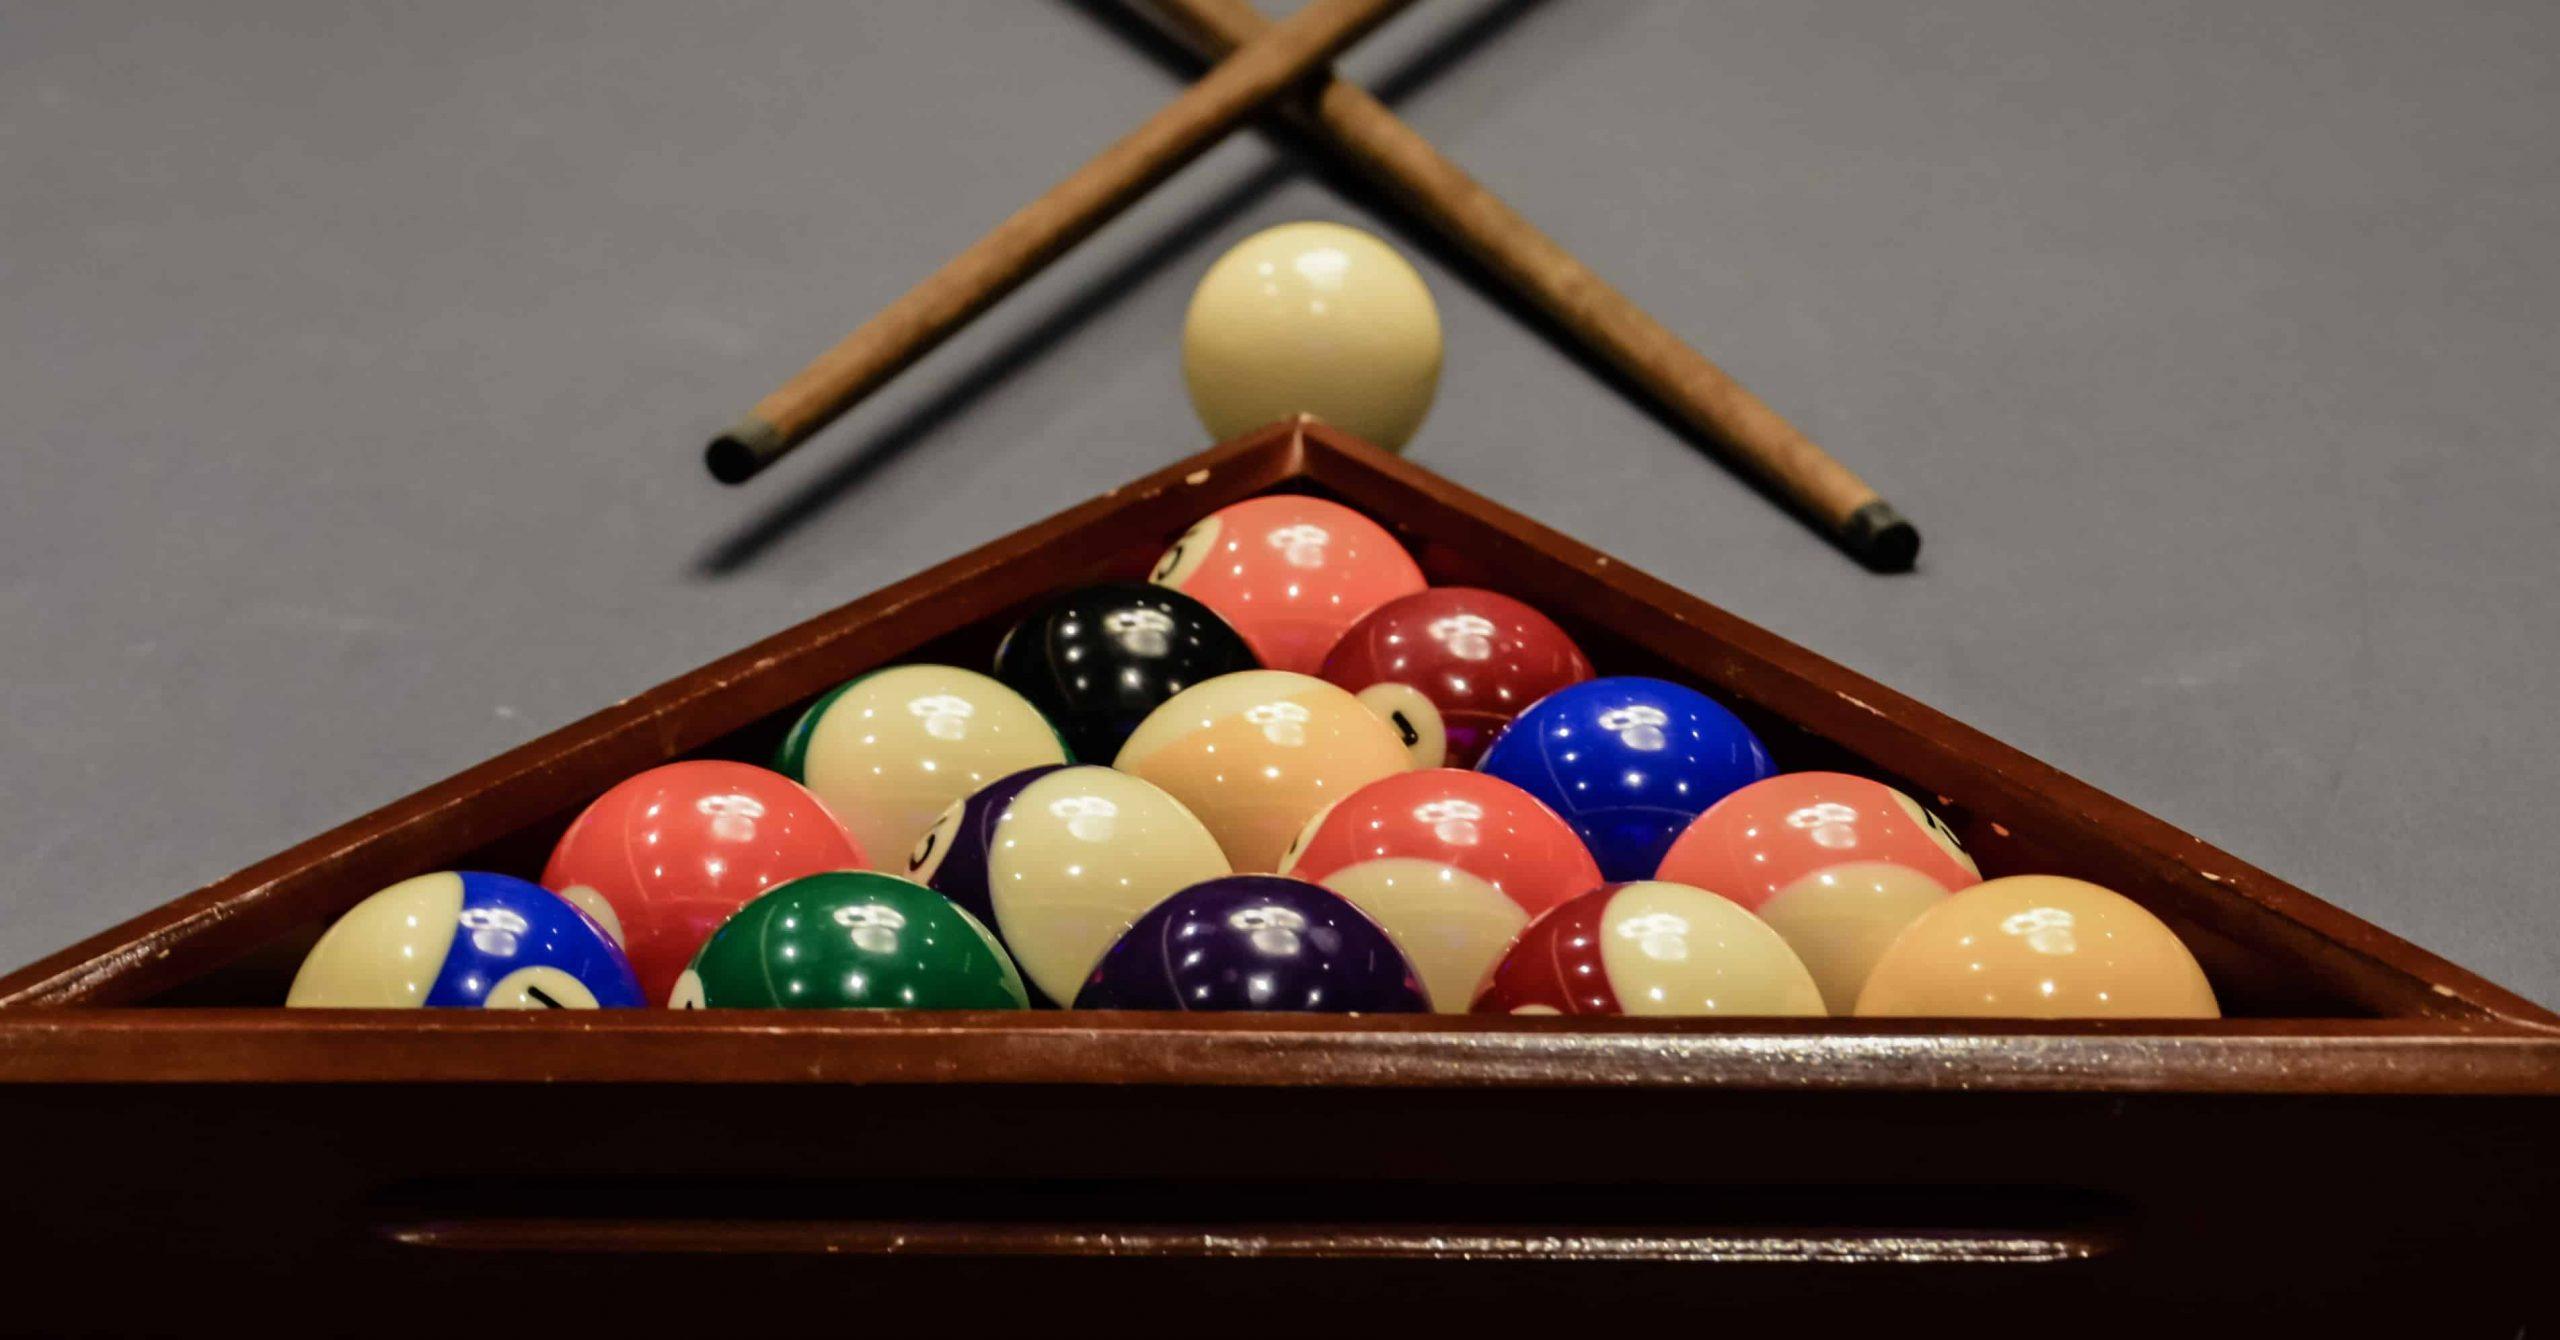 How to Rack Pool Balls Correctly